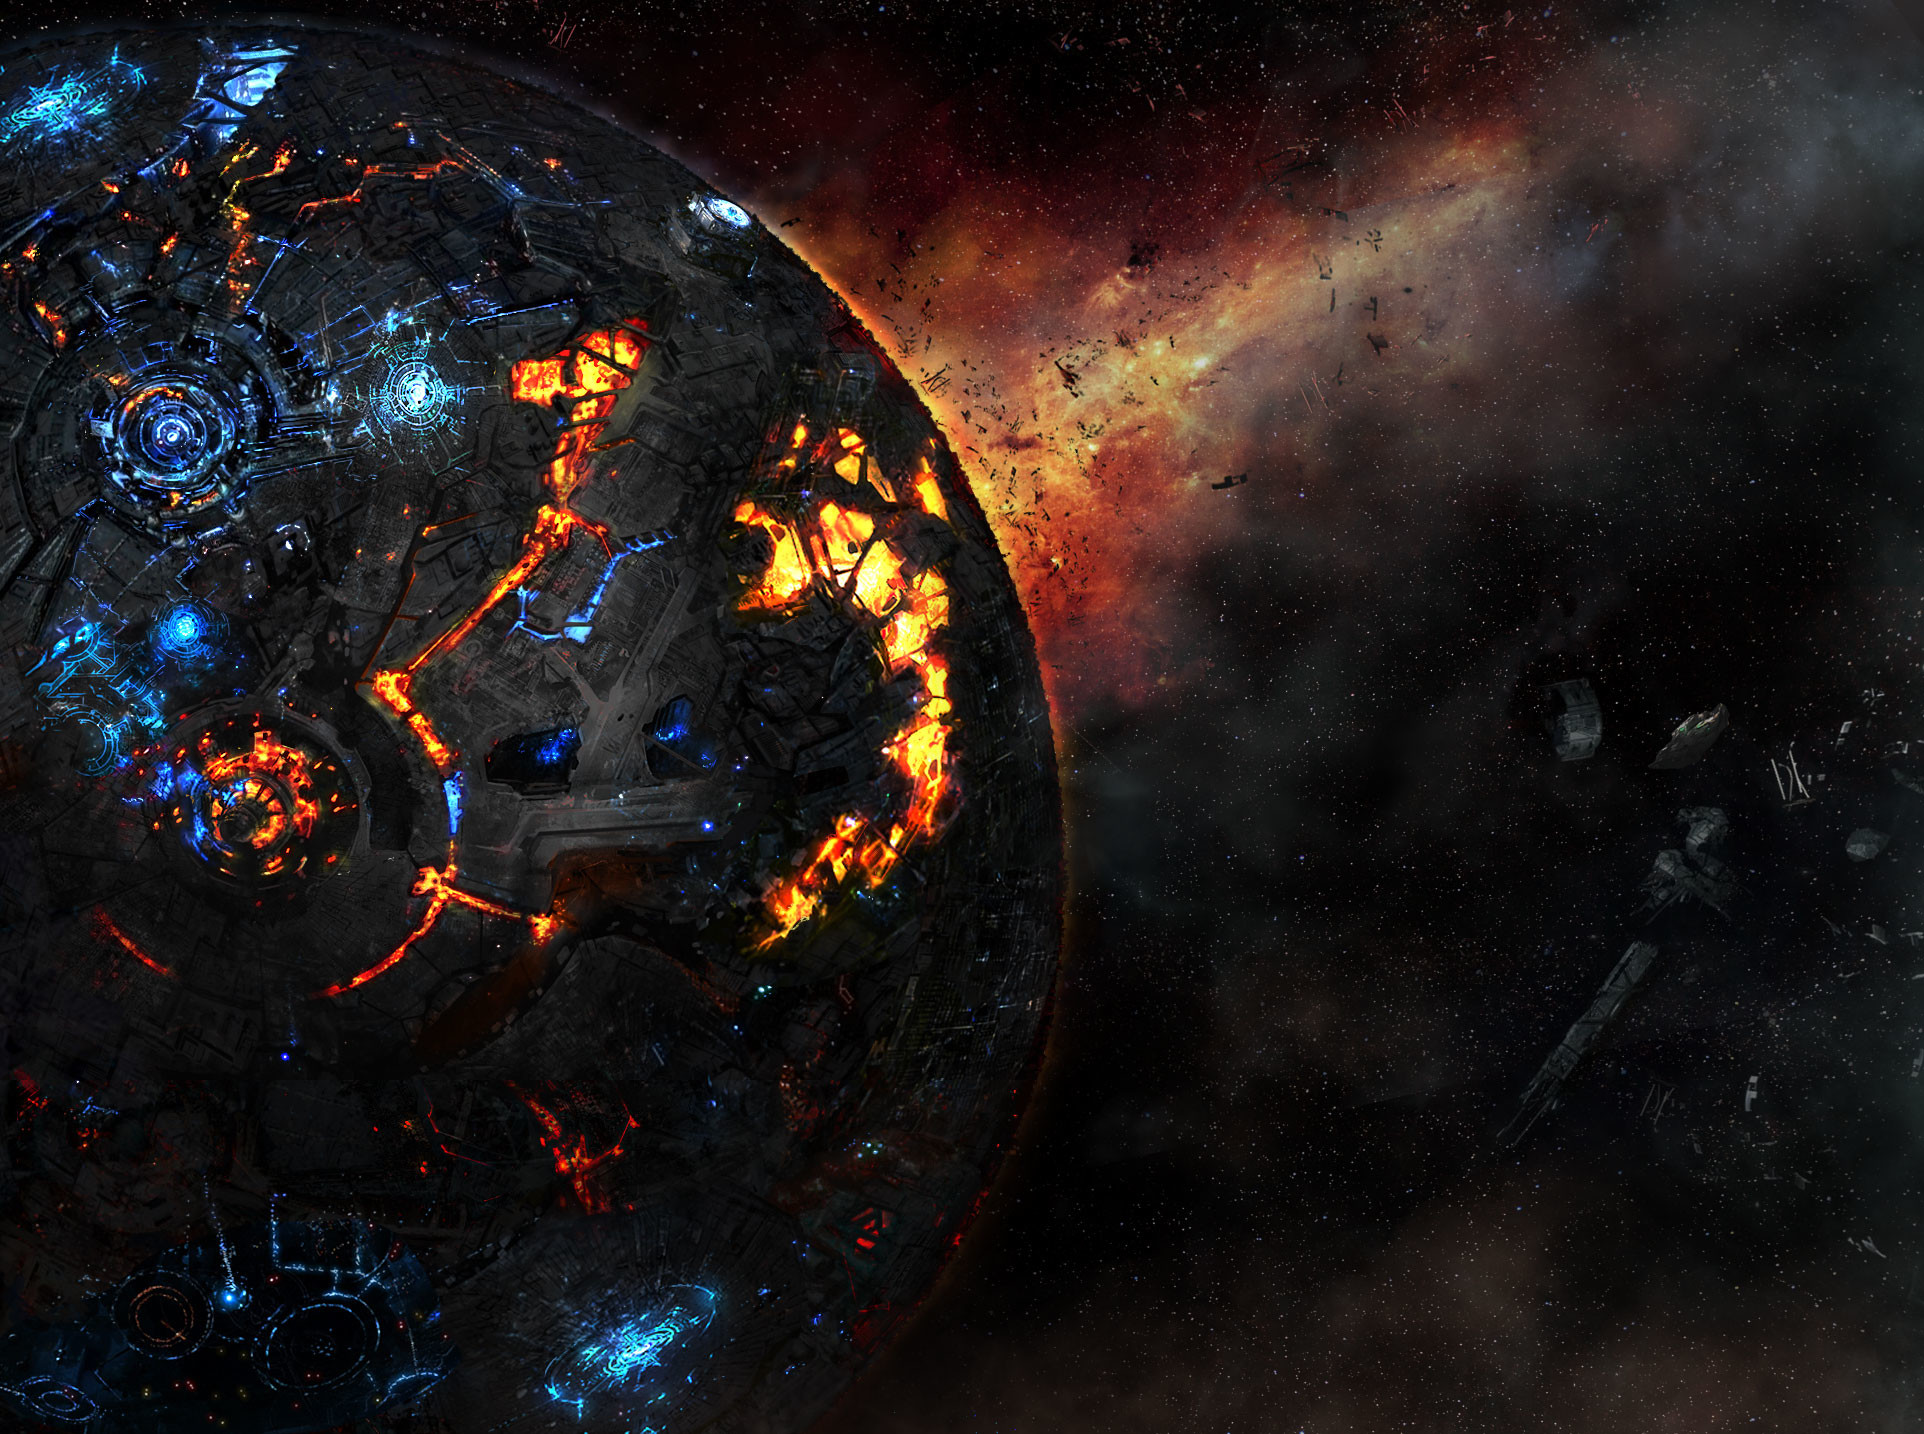 Fall of Transformers Cybertron Wallpapers HD Wallpaper